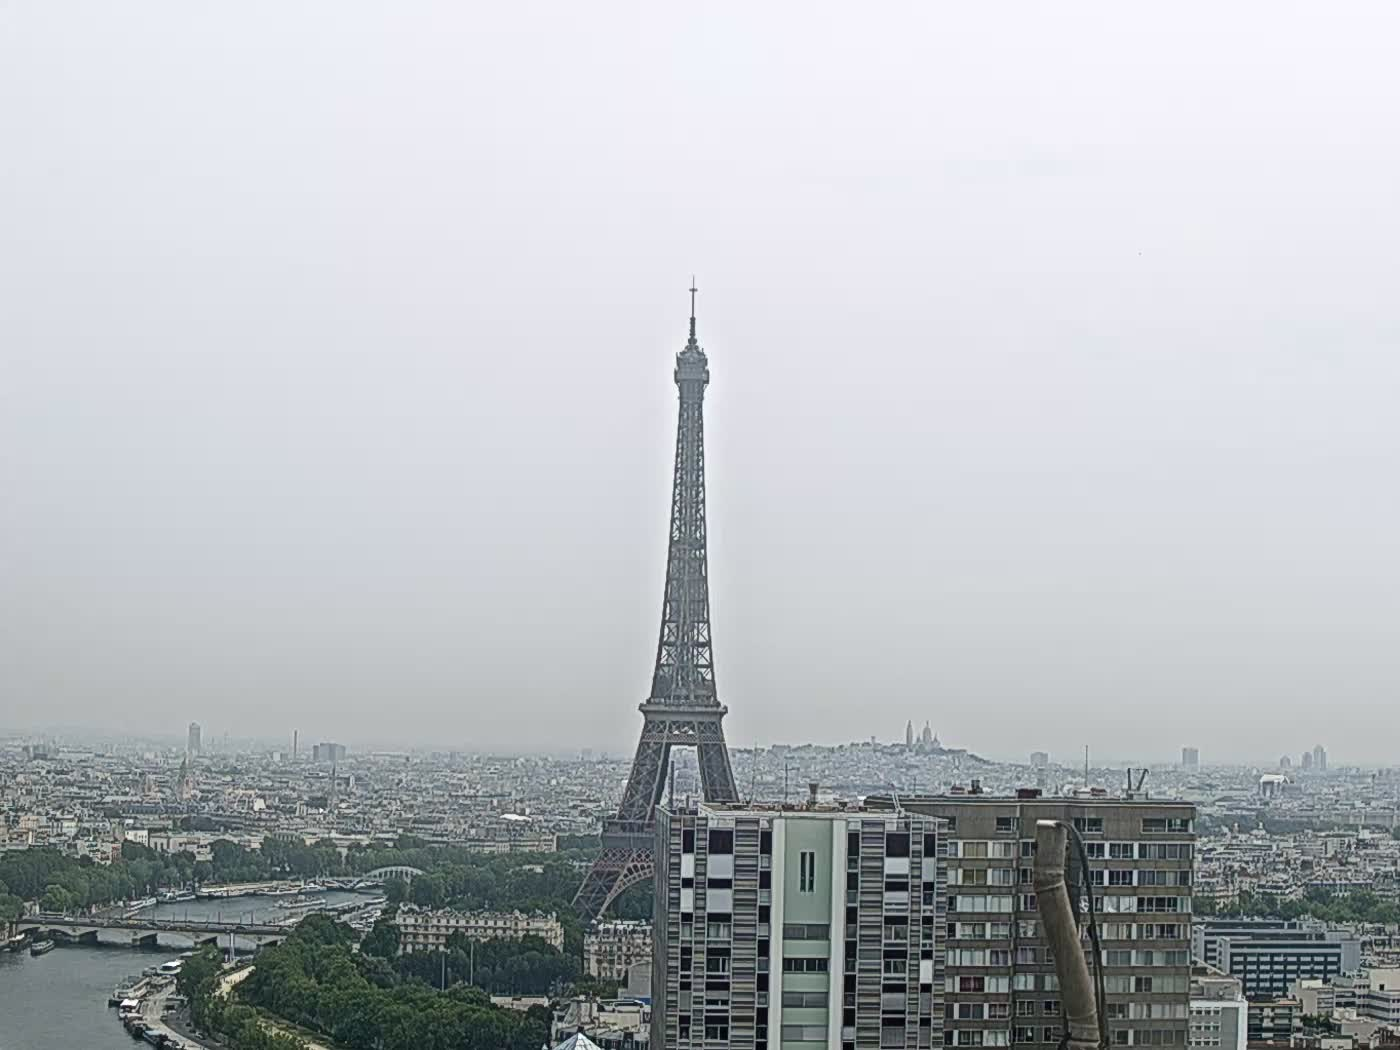 Paris Thu. 11:22